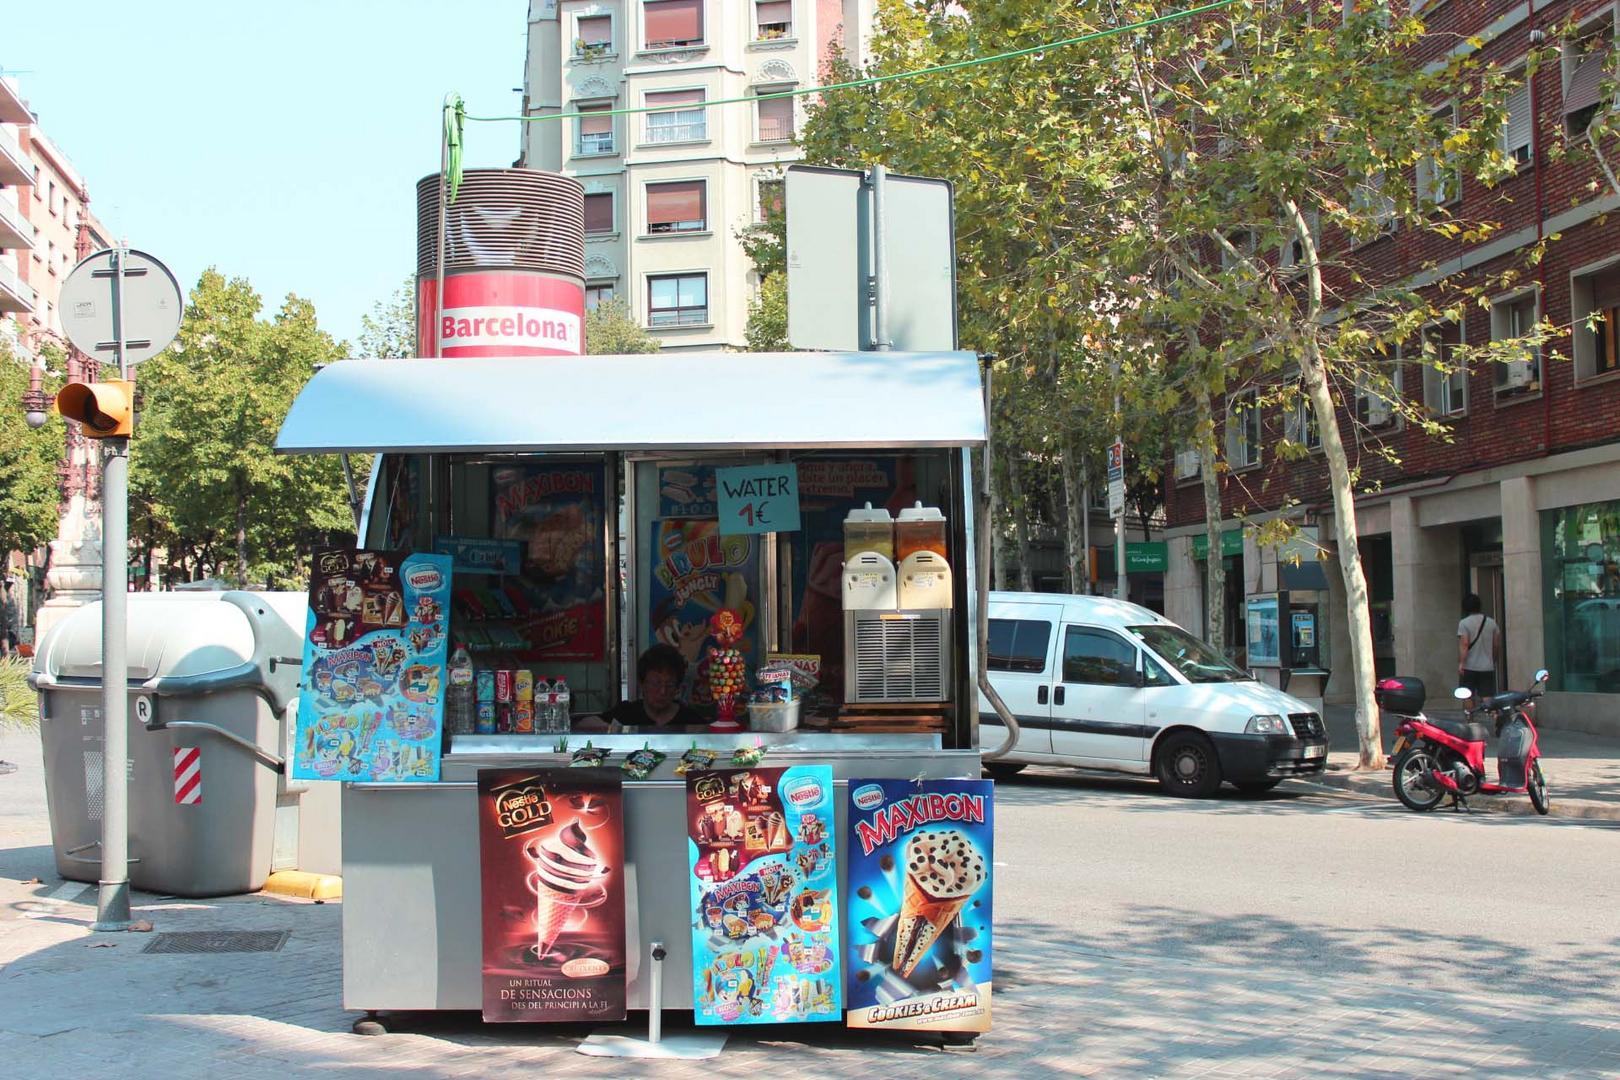 Barcelona. Water 1 Euro